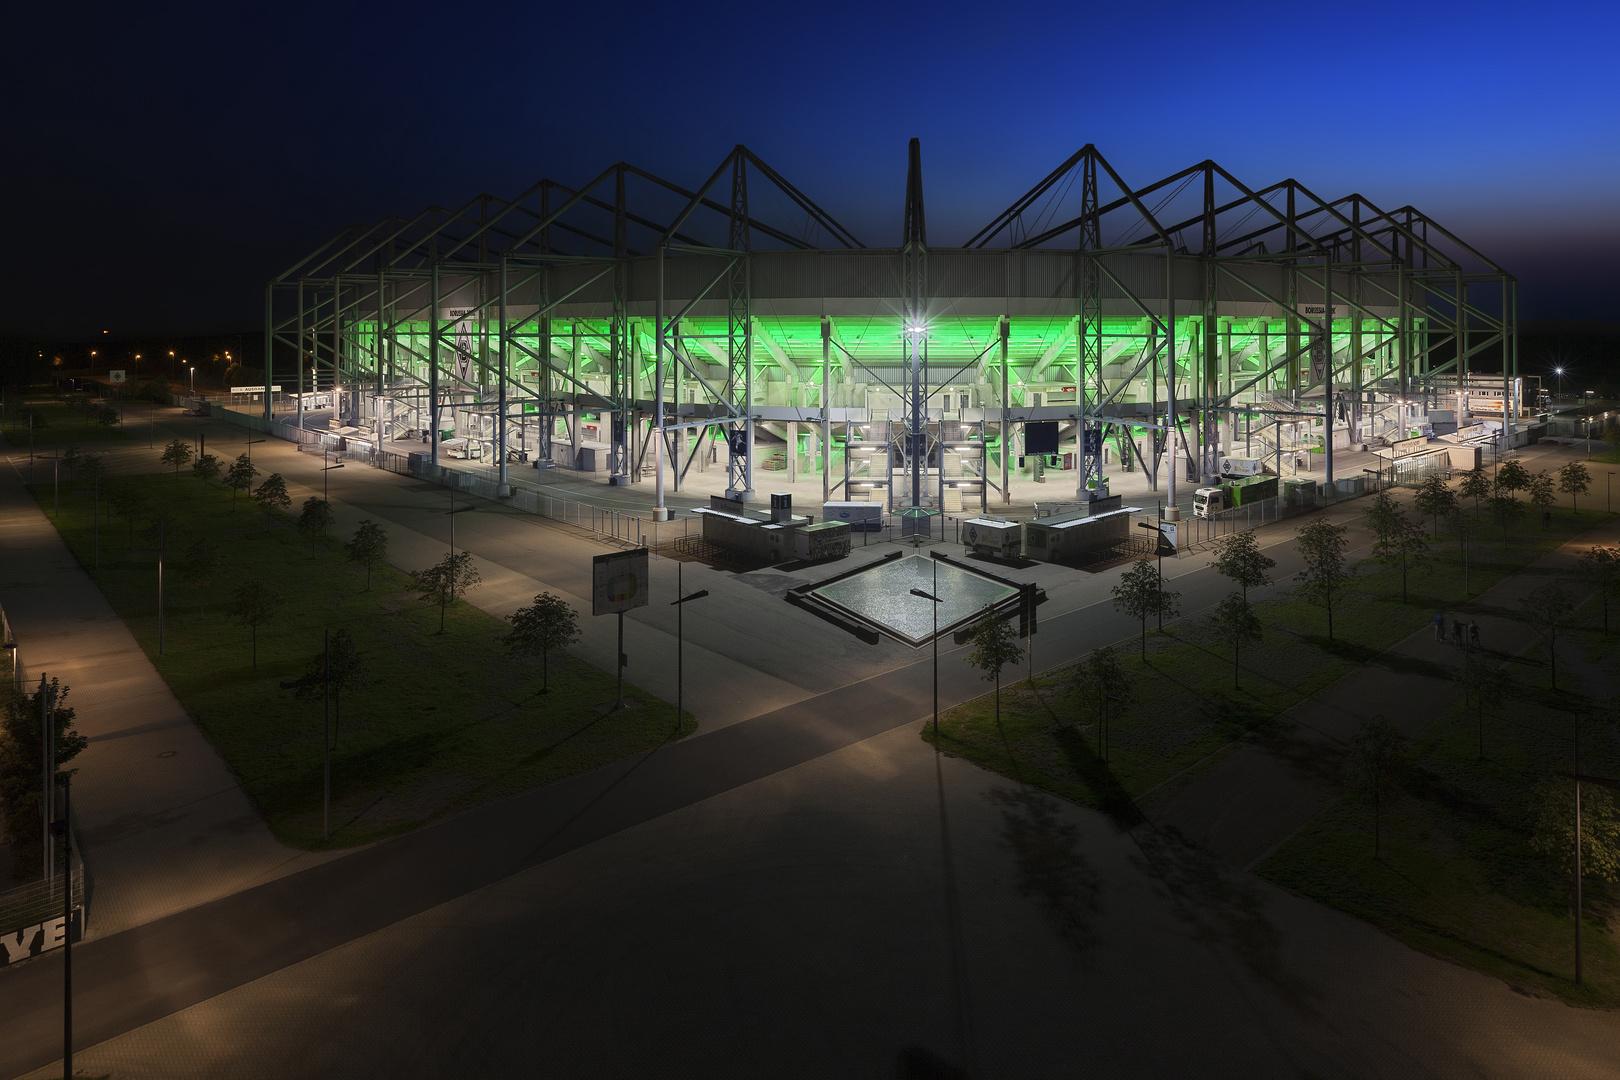 Startseite Borussia Mönchengladbach